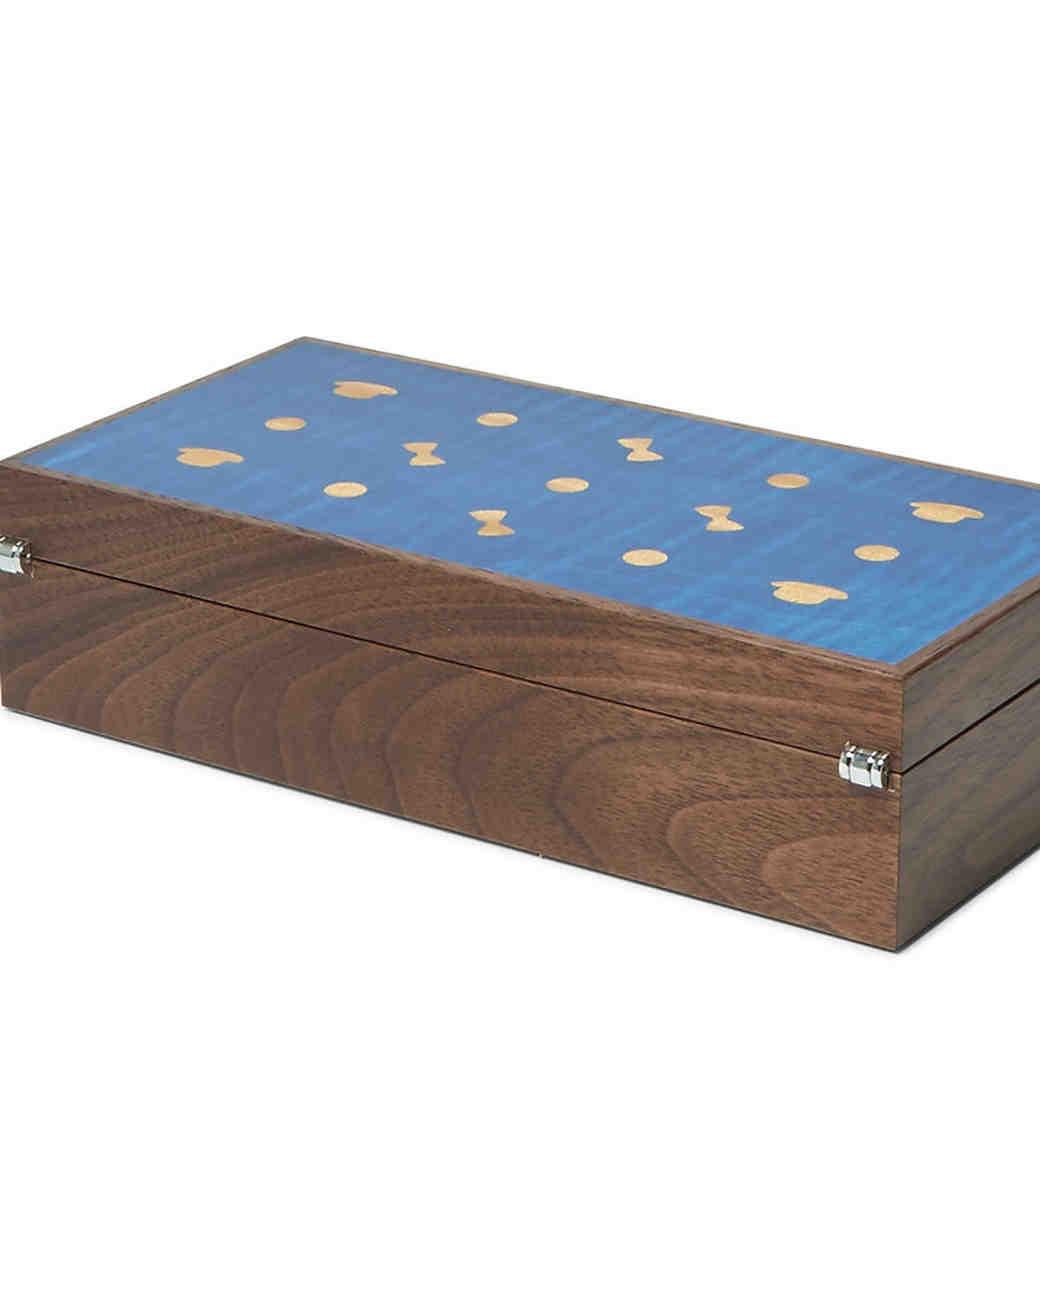 linley cufflink box